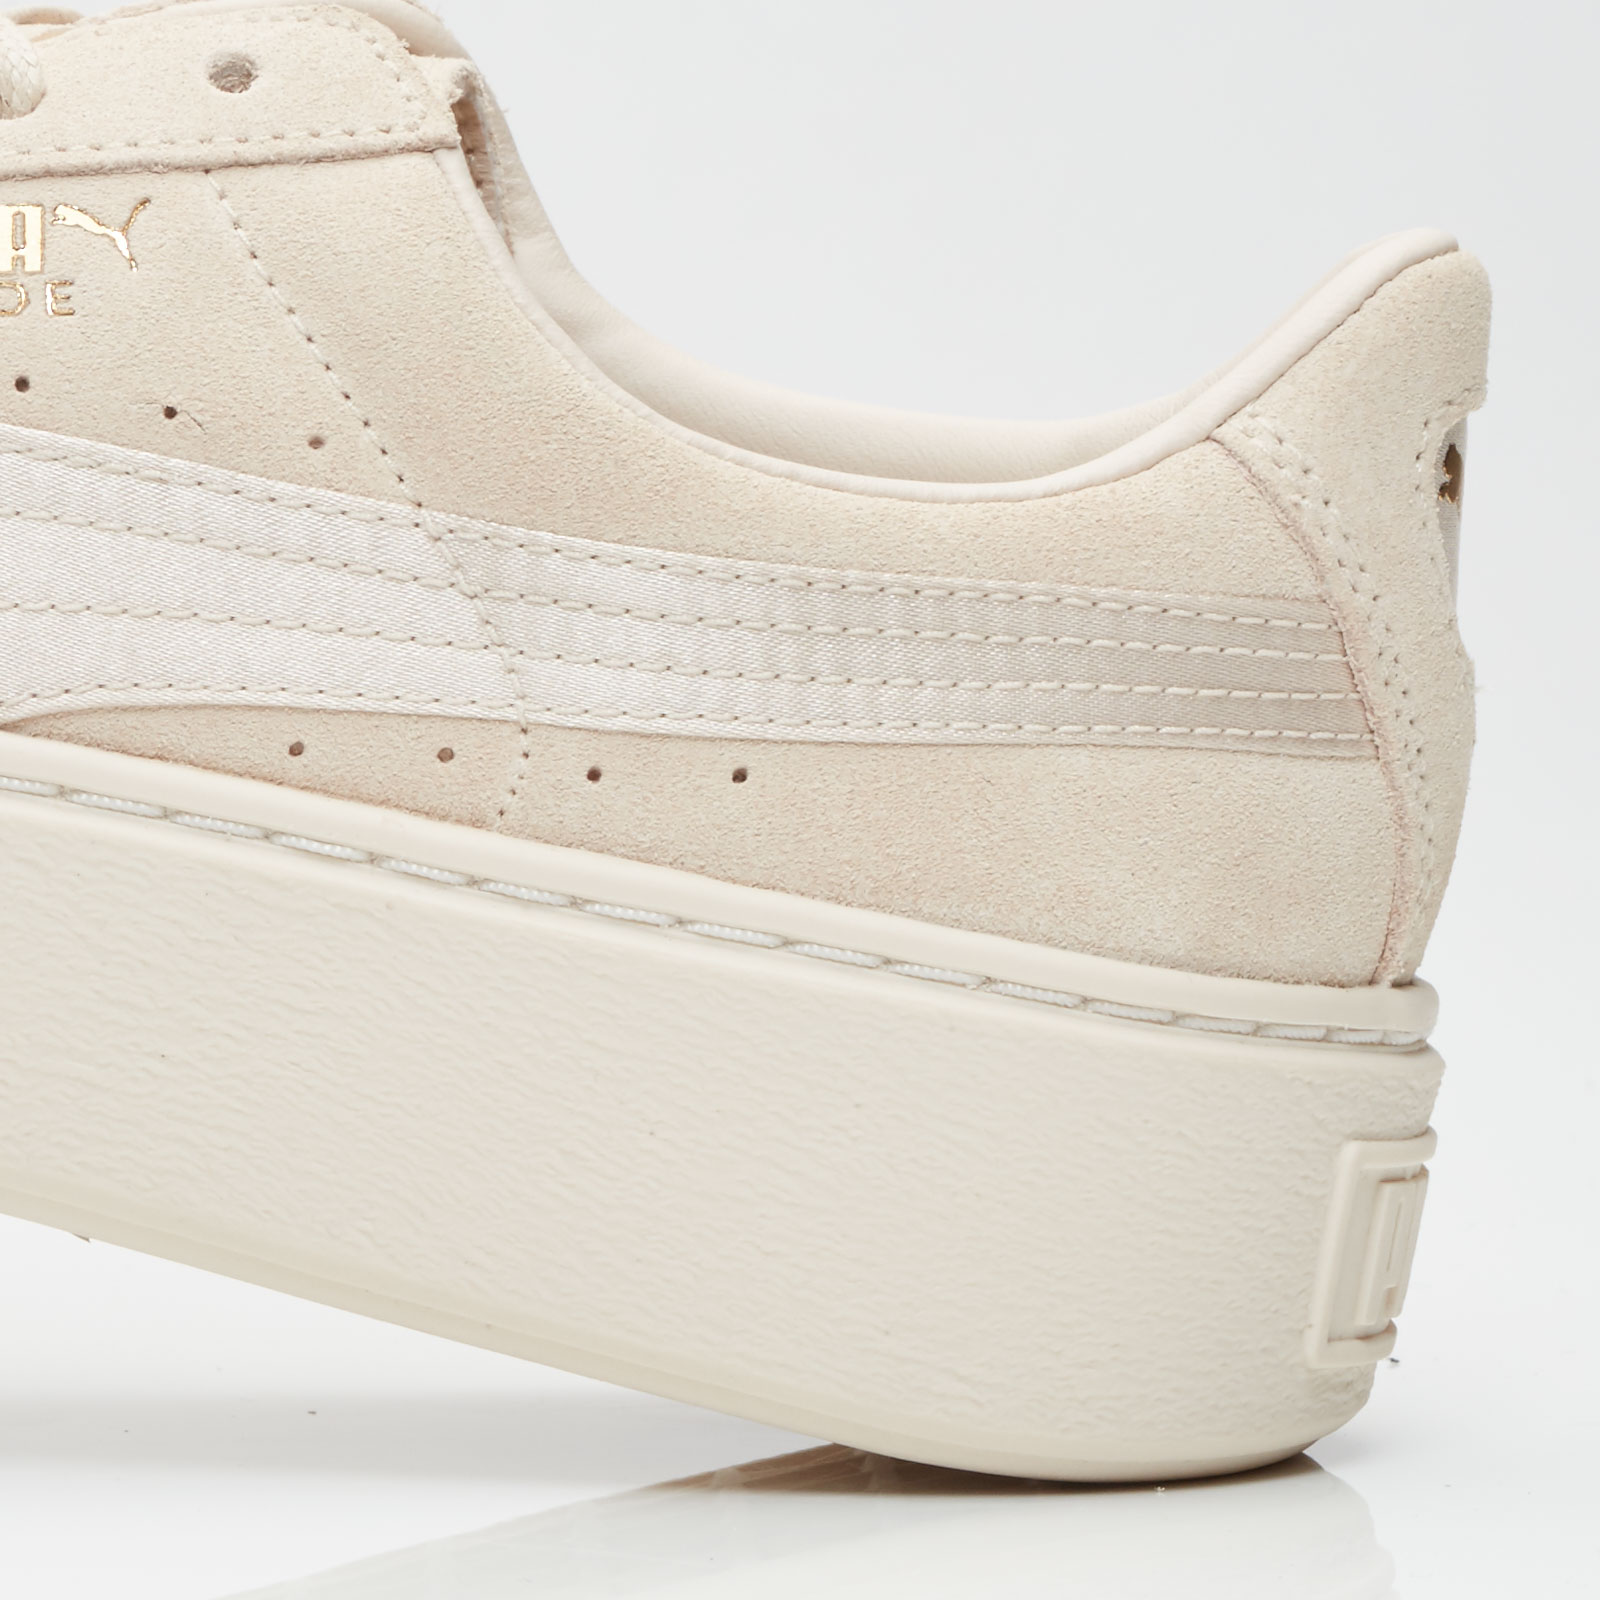 a62d753f302 Puma Suede Platform Satin Wns - 365828-02 - Sneakersnstuff ...